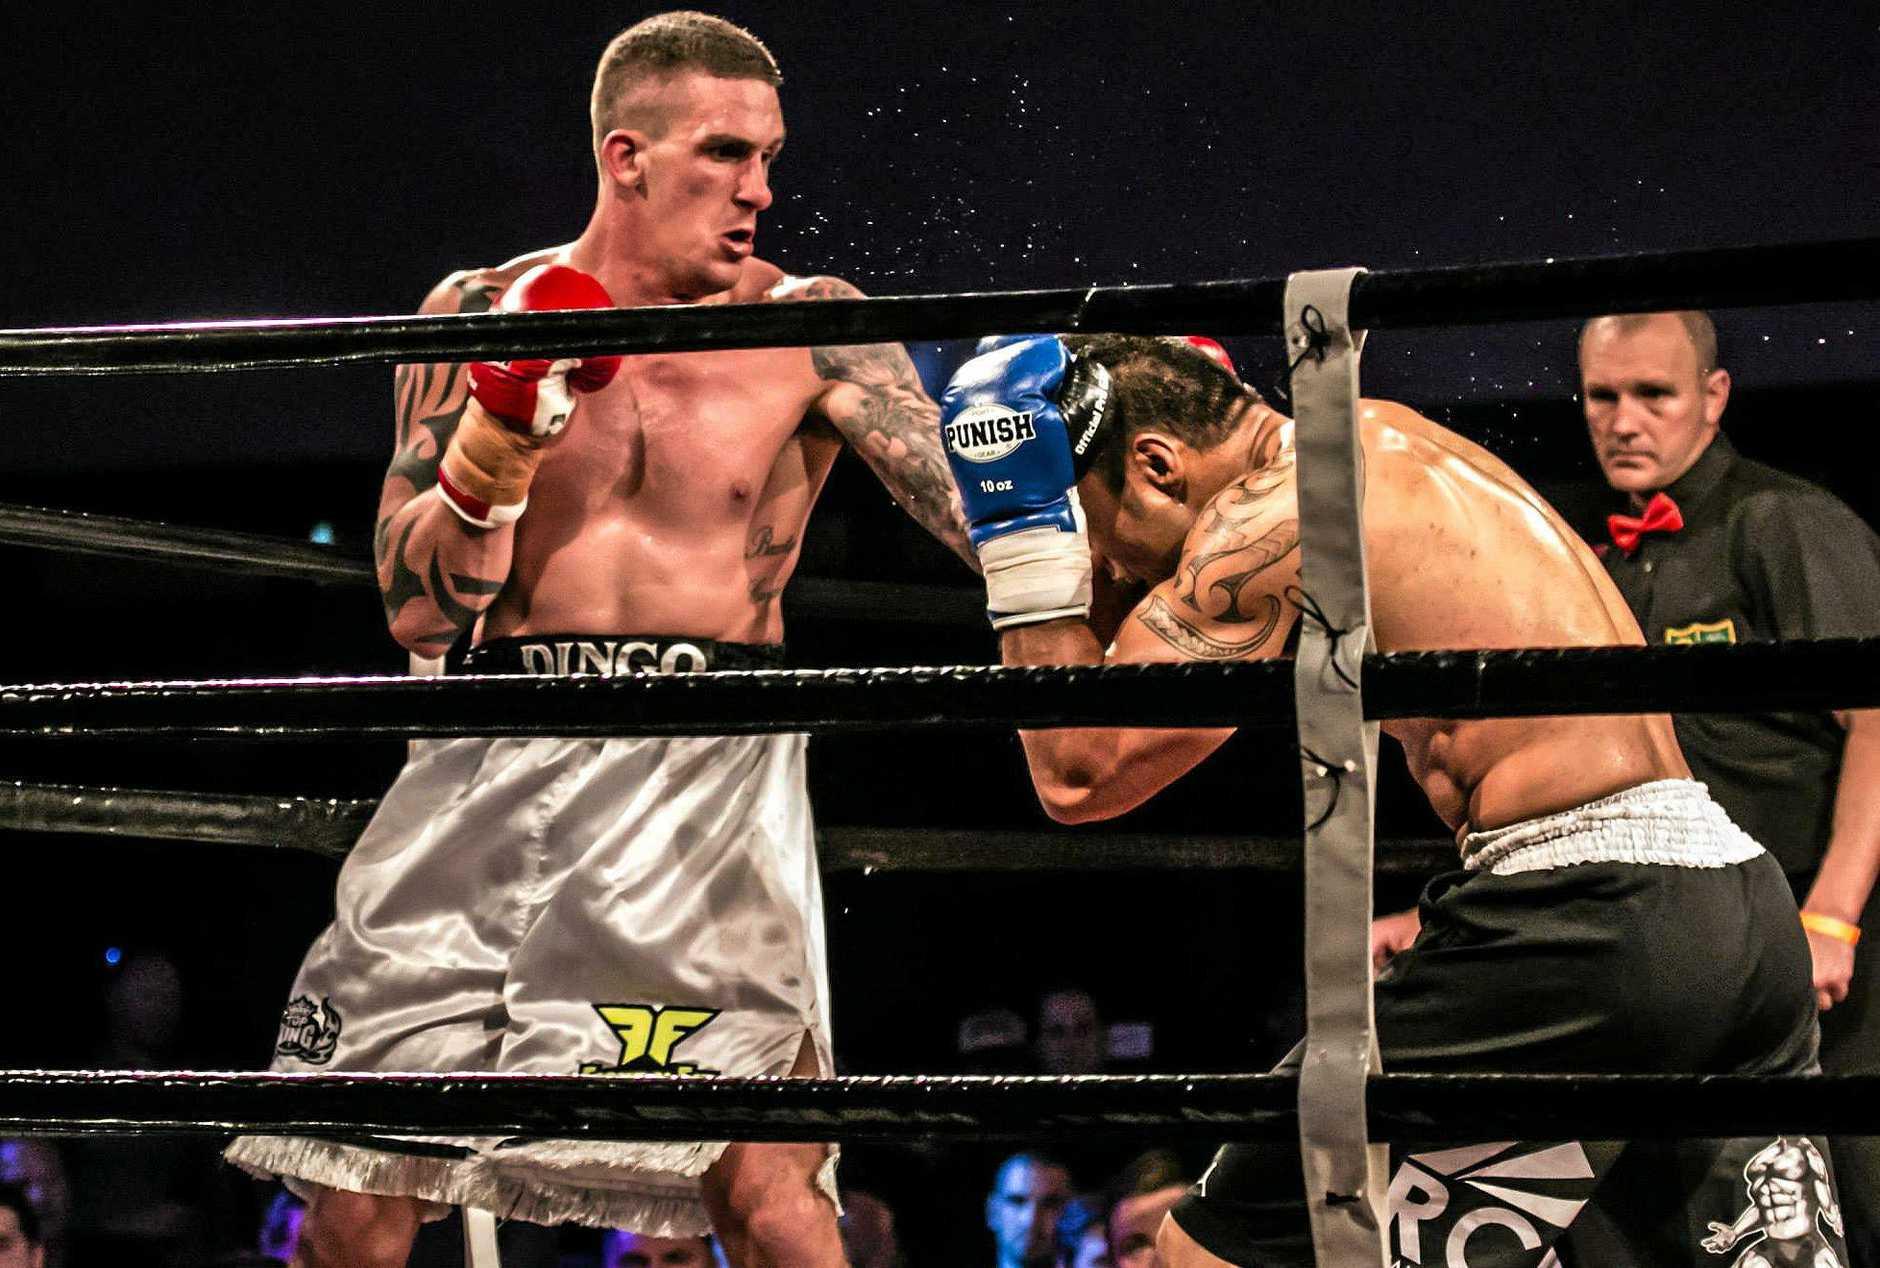 Kurtis Pegoraro (left) won the Qld cruiserweight boxing title on Saturday Photo: SM Gullary